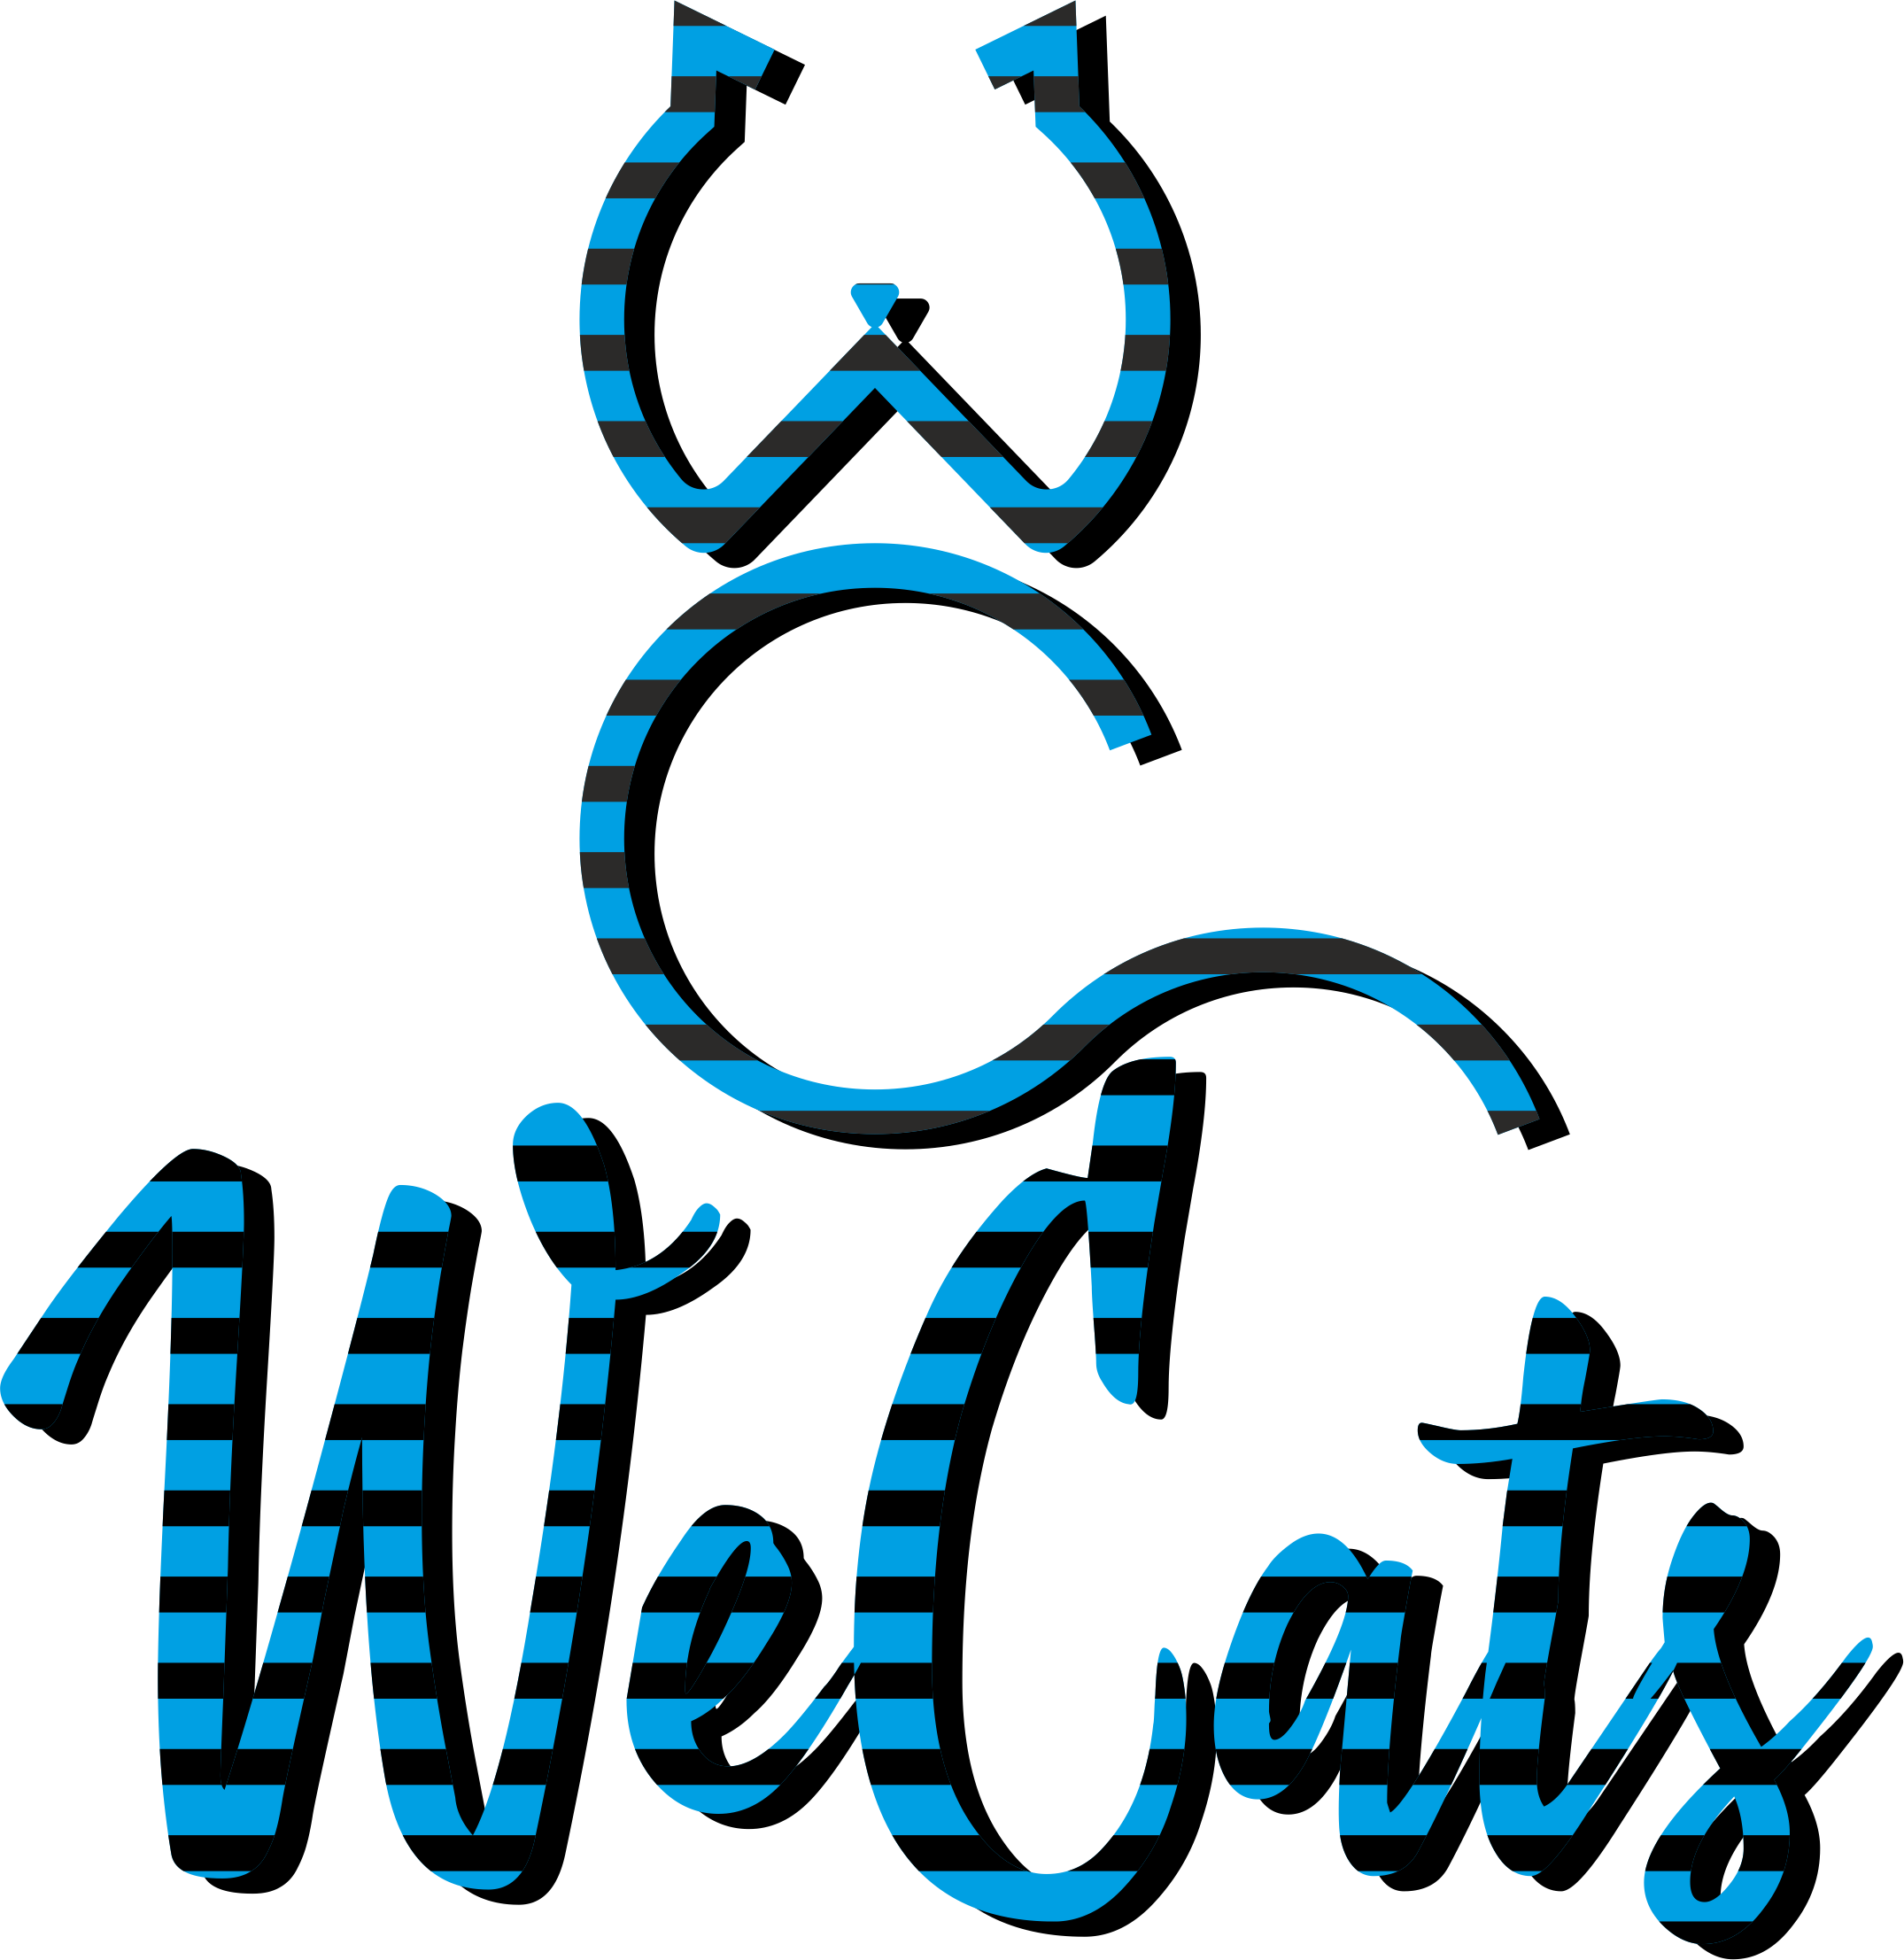 Создание логотипа WeCats фото f_8565f1adf407713c.png